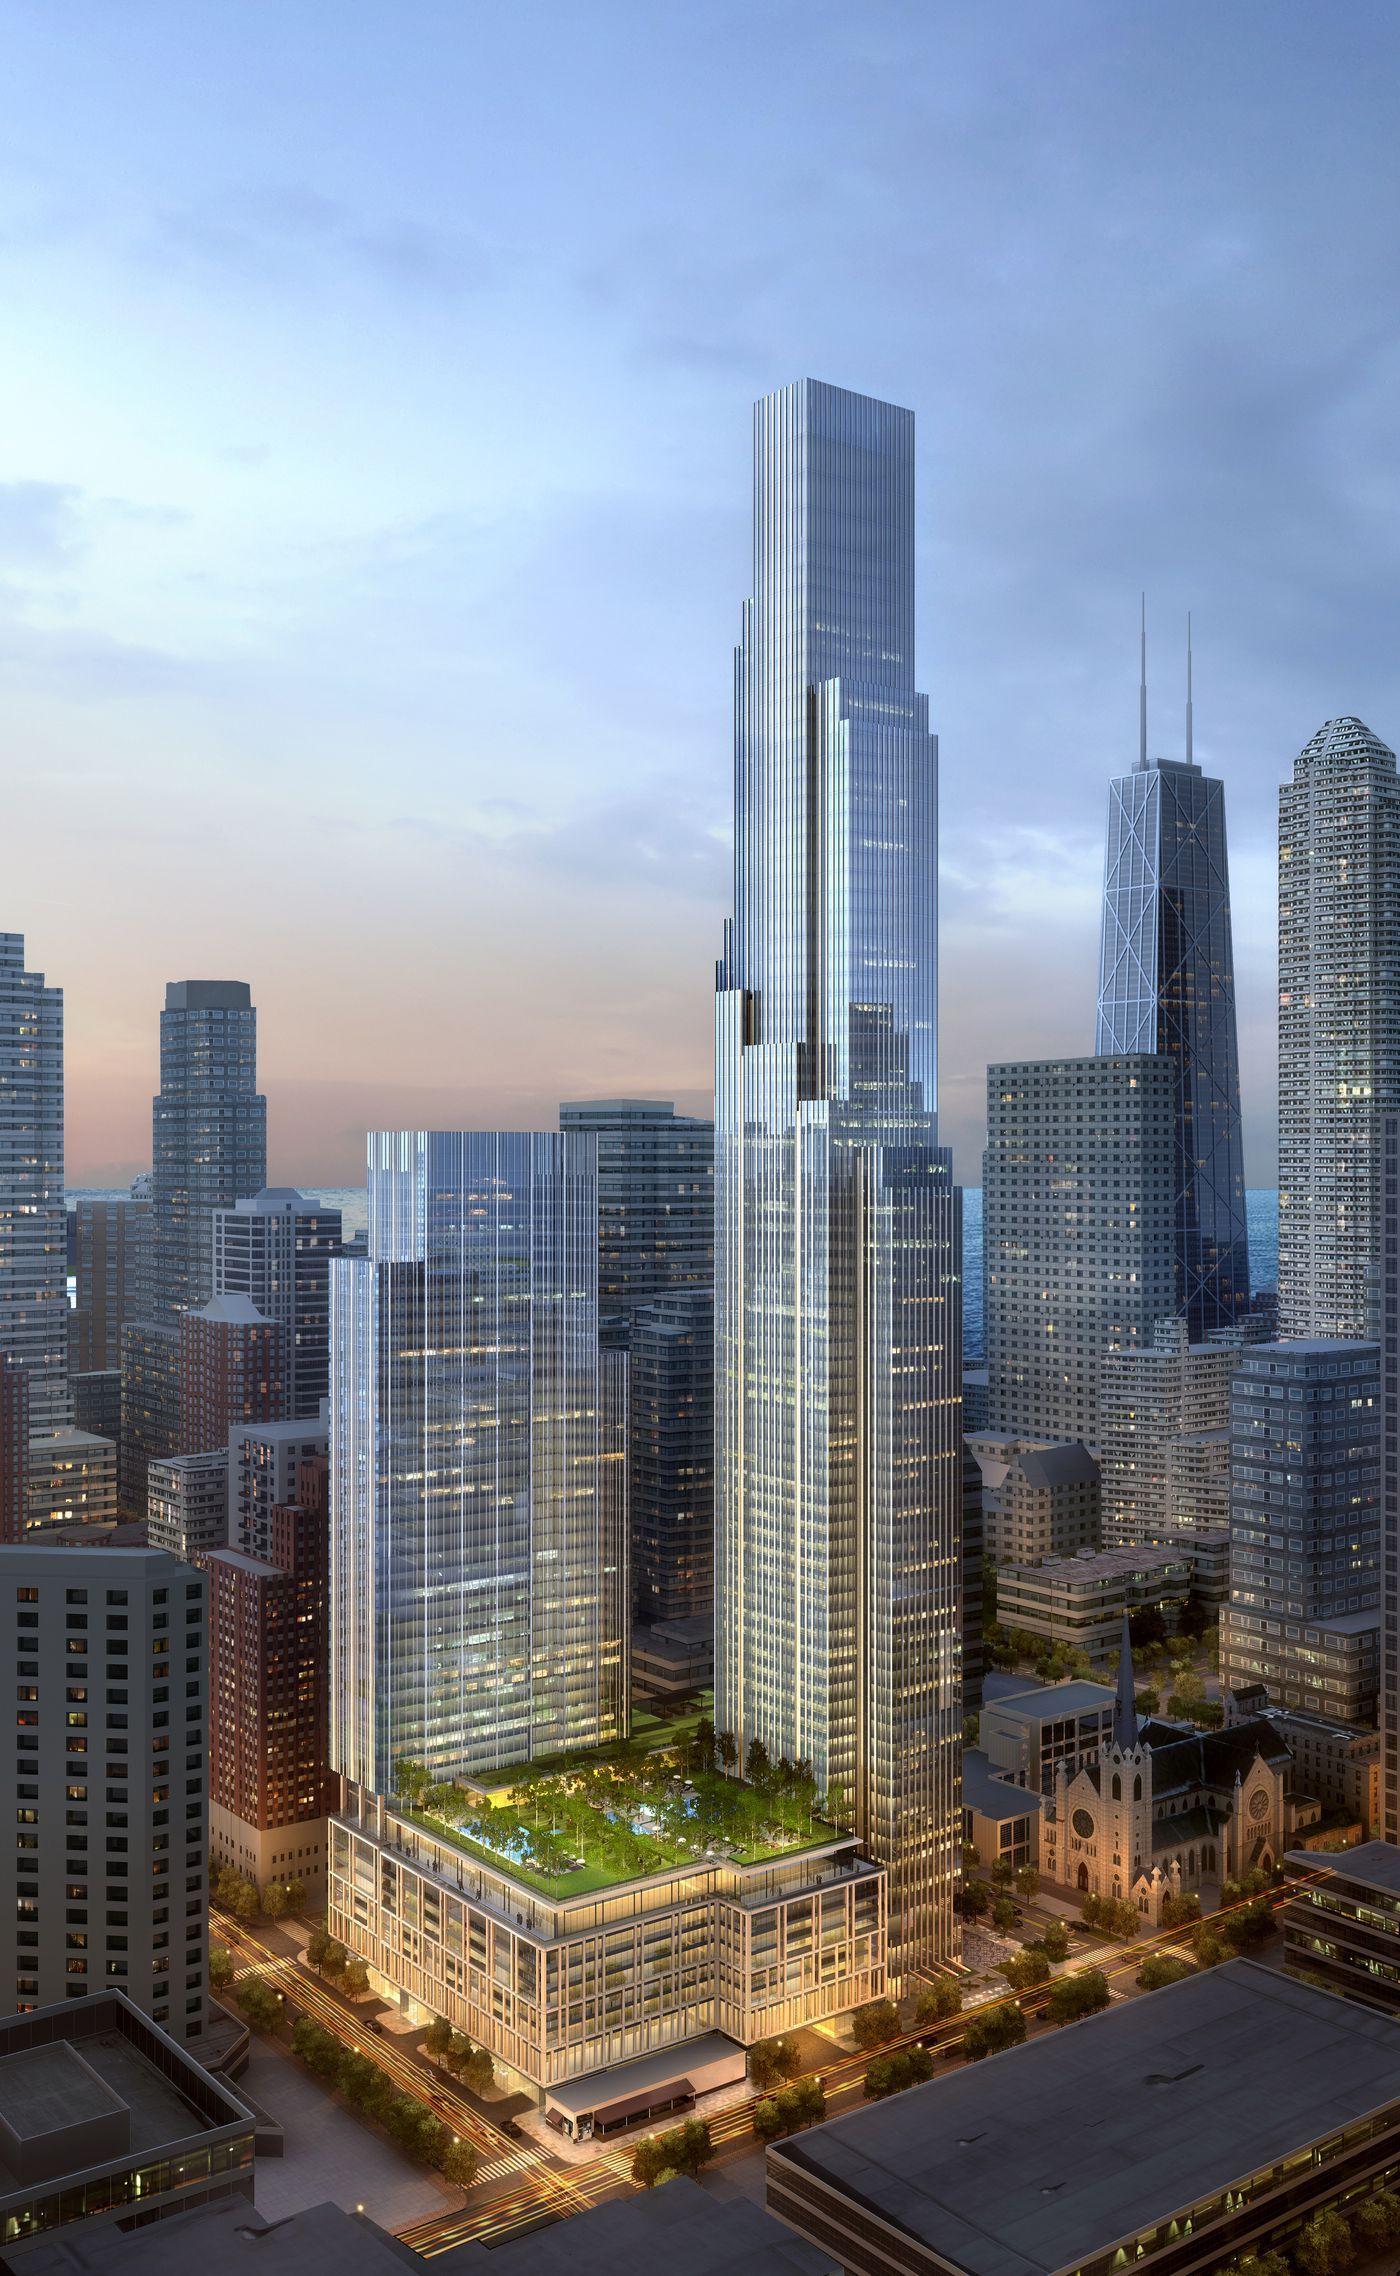 Arets skyskrapa star i chicago